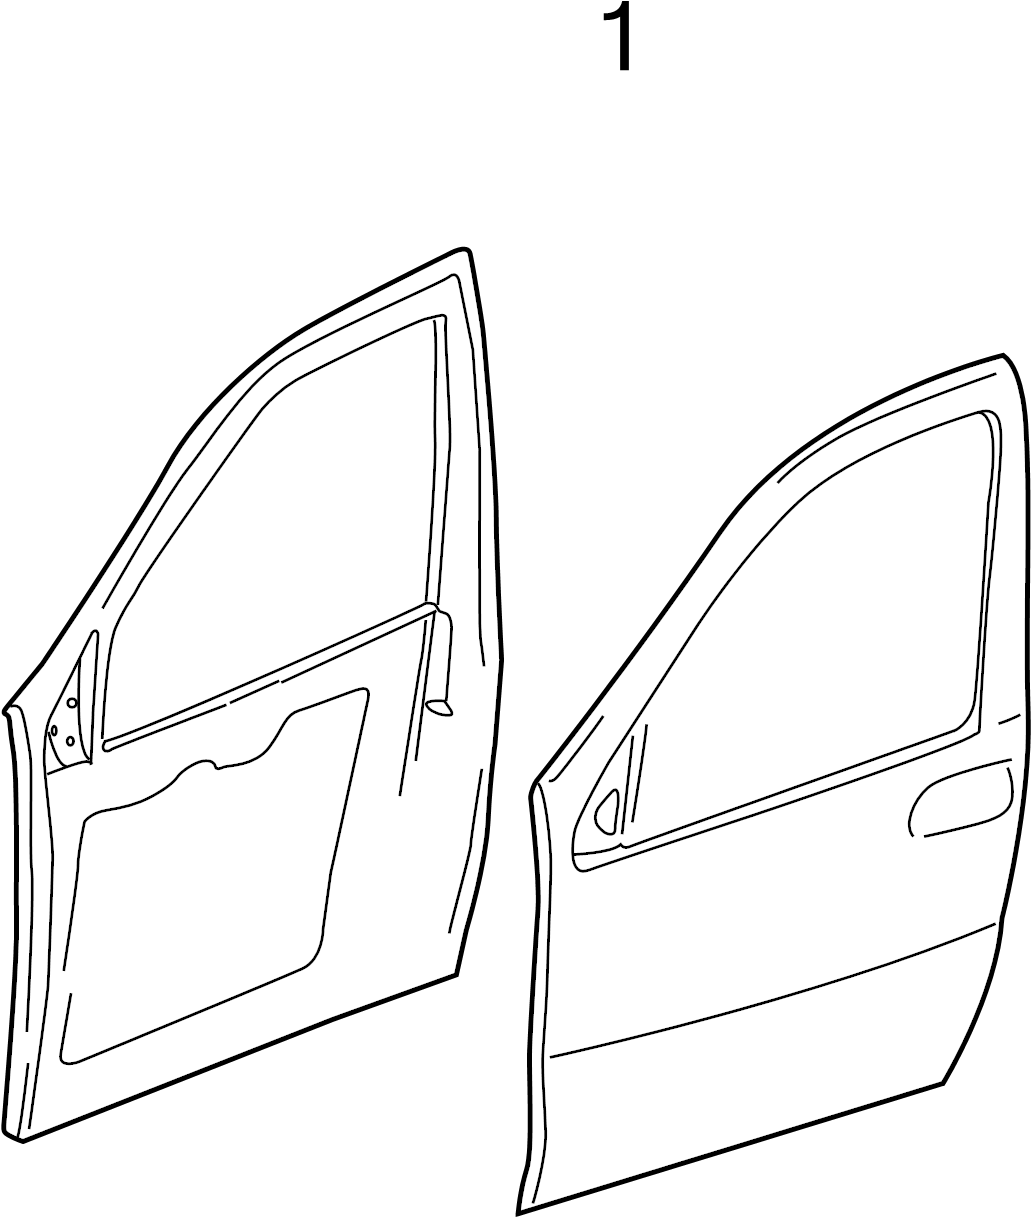 2005 Pontiac Montana Sv6 Fuse Box. Pontiac. Auto Fuse Box